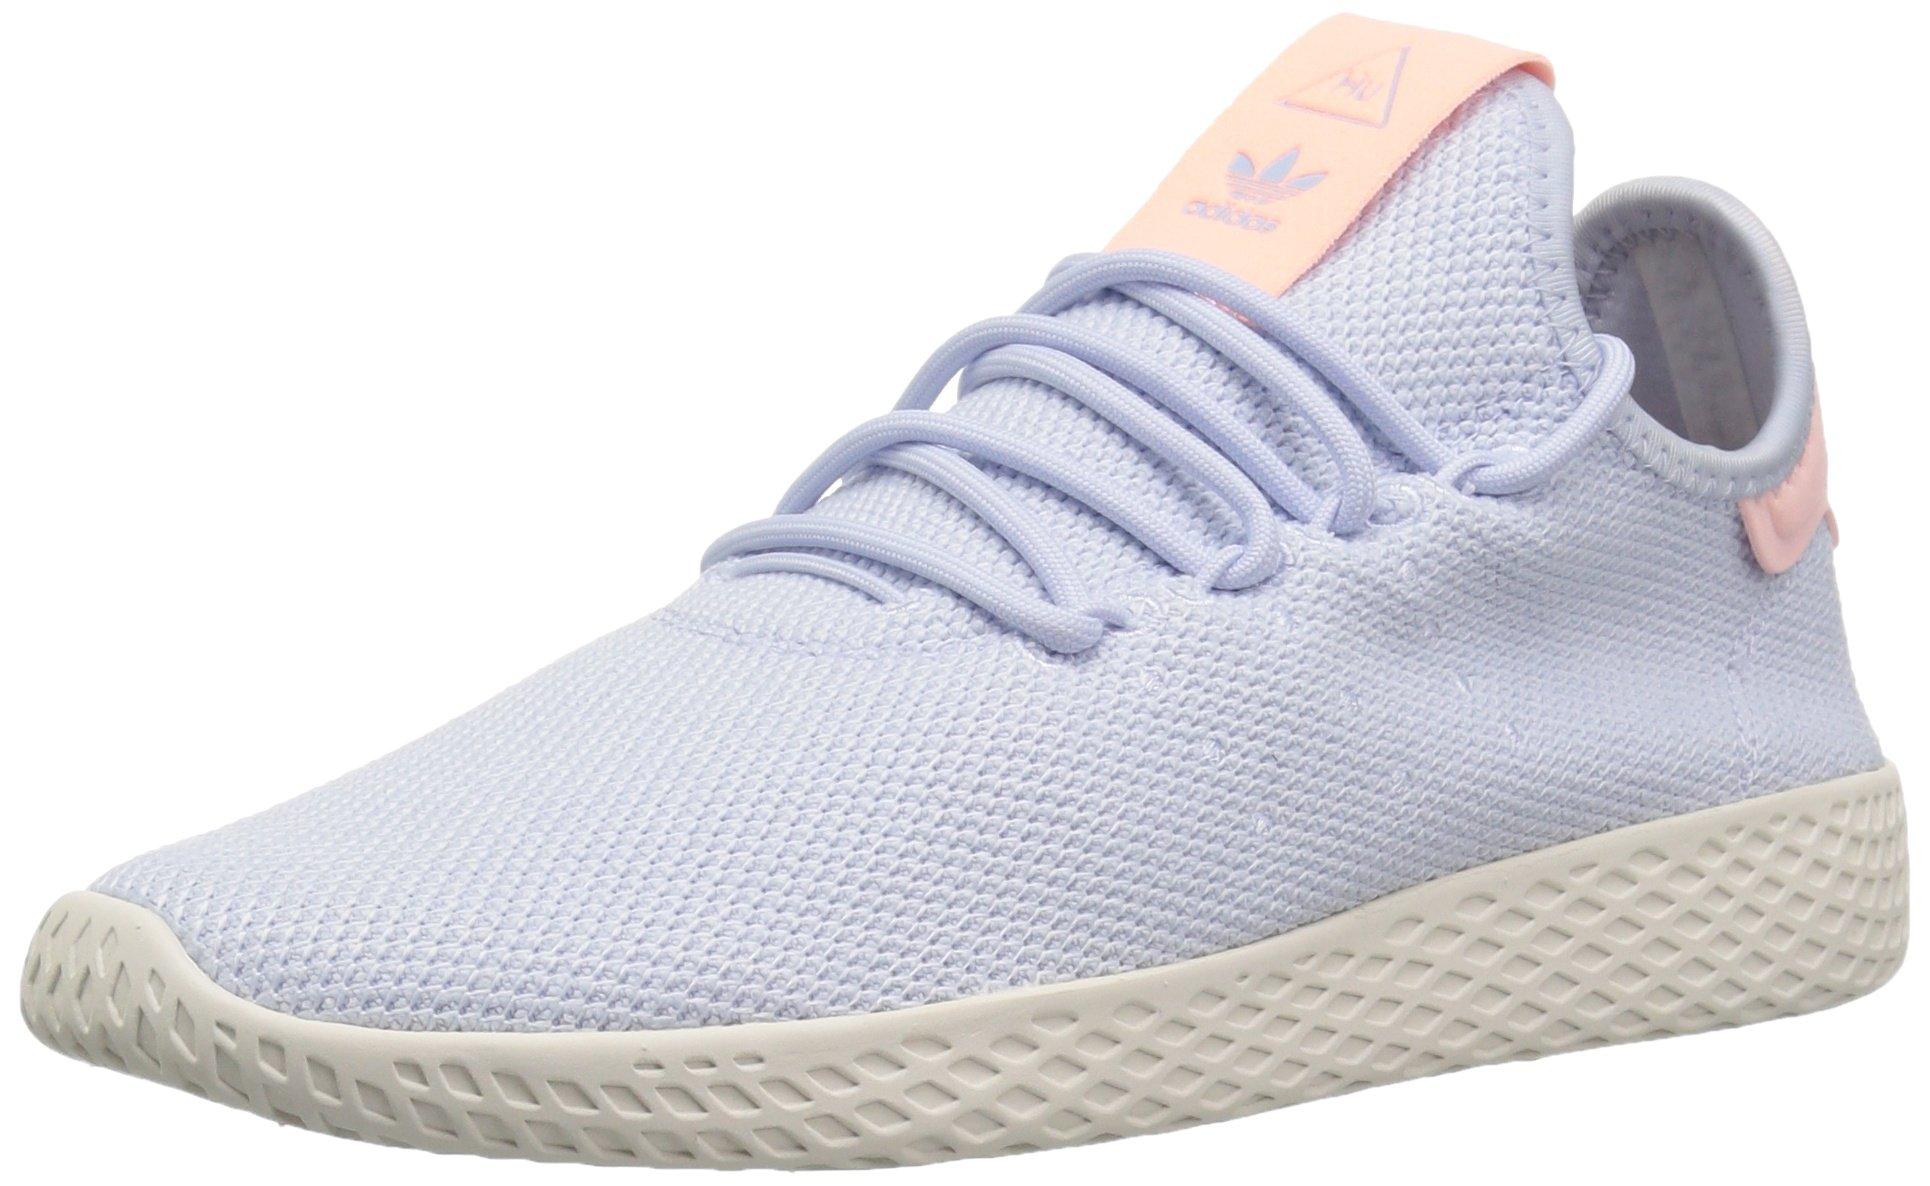 adidas Originals Women's PW HU Tennis Shoe, Aero Blue/Aero Blue/Chalk White, 8 M US